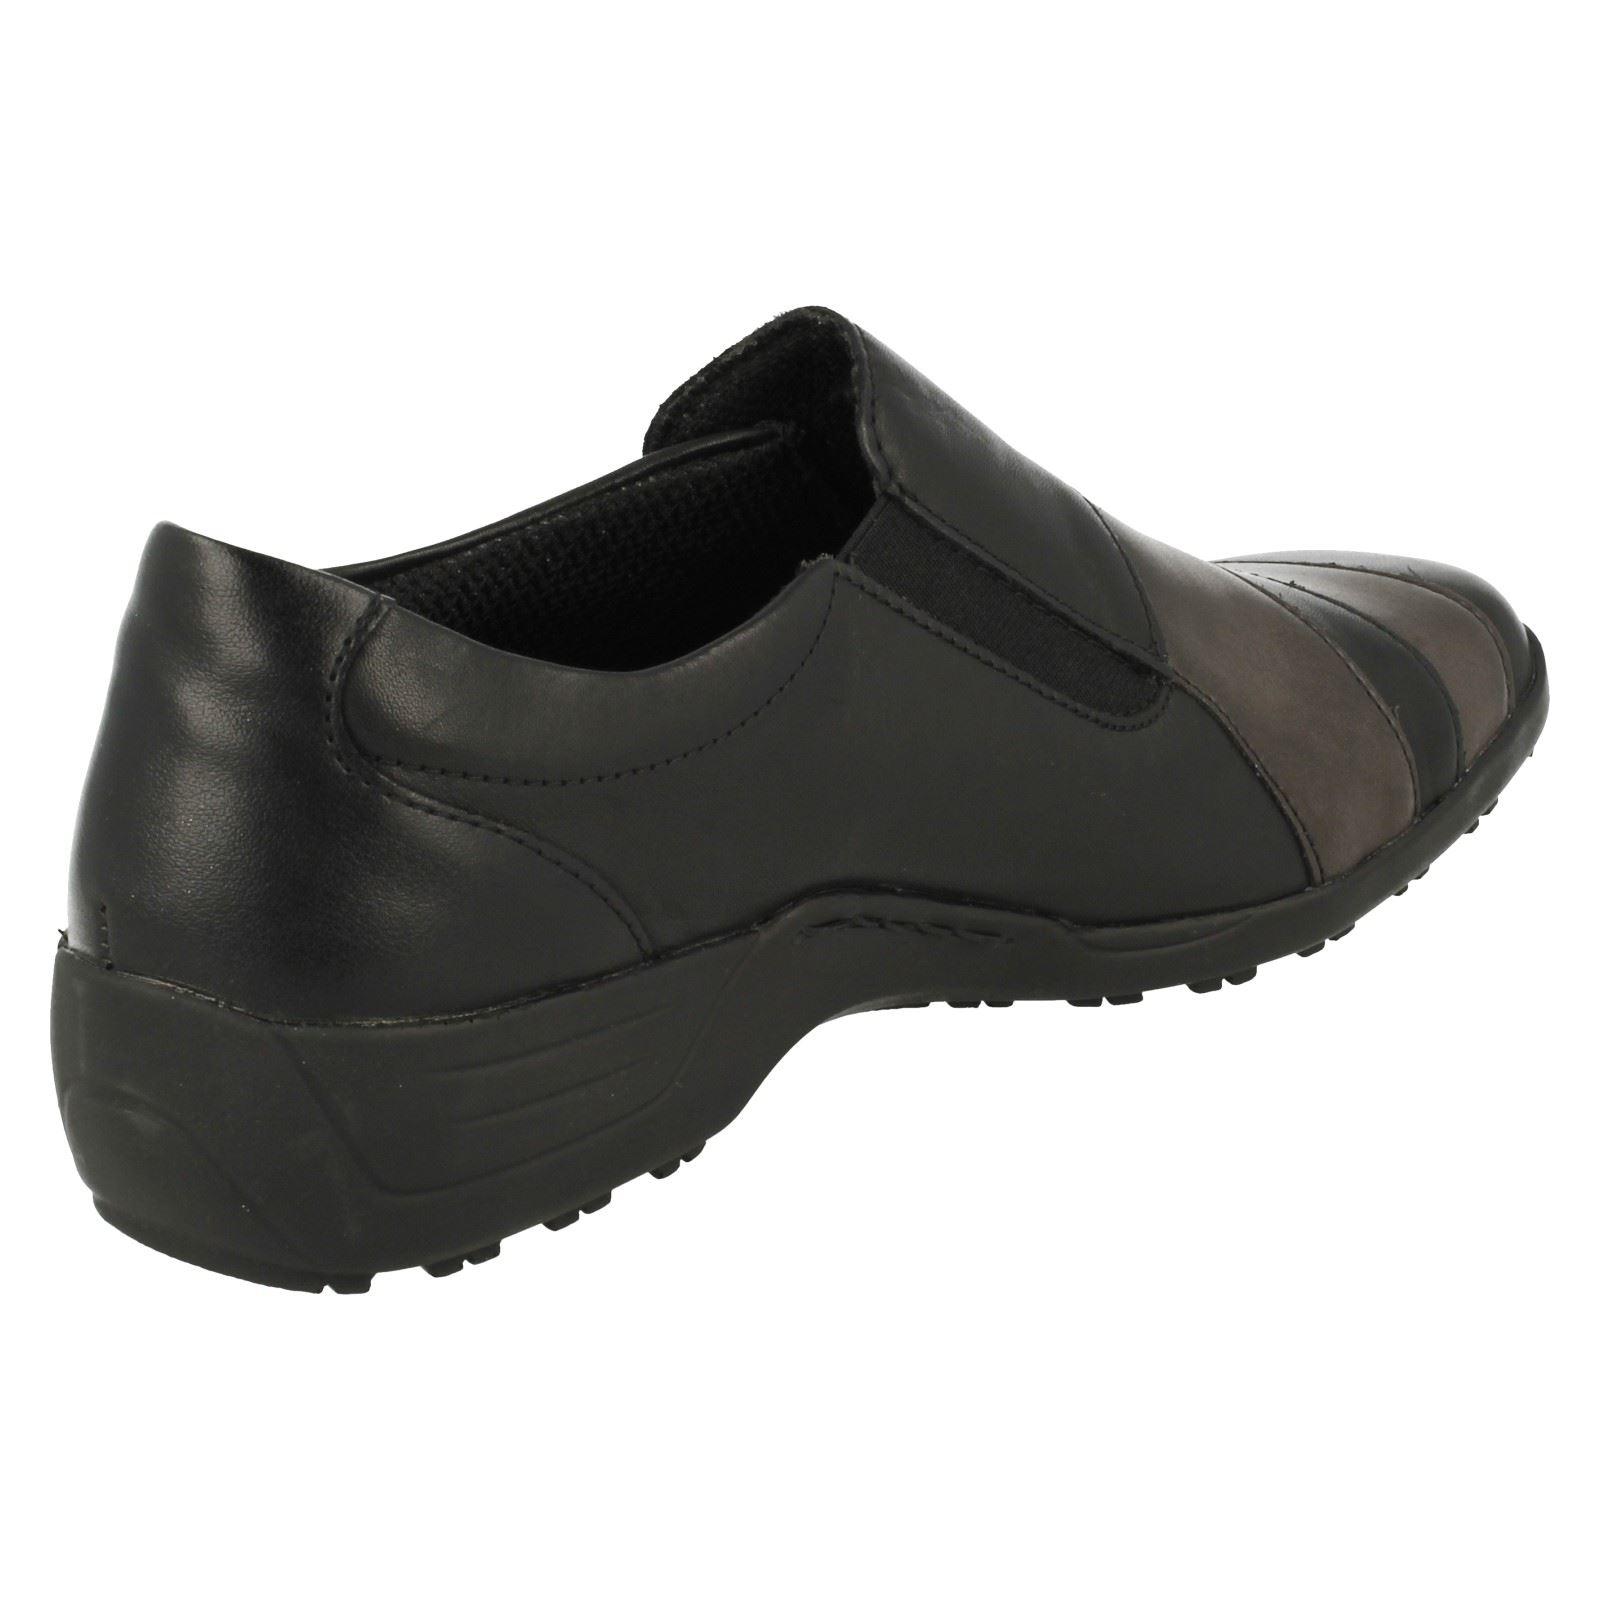 dfc5c704724 Ladies-Remonte-Slip-On-Loafer-Shoes-D0525 thumbnail 9